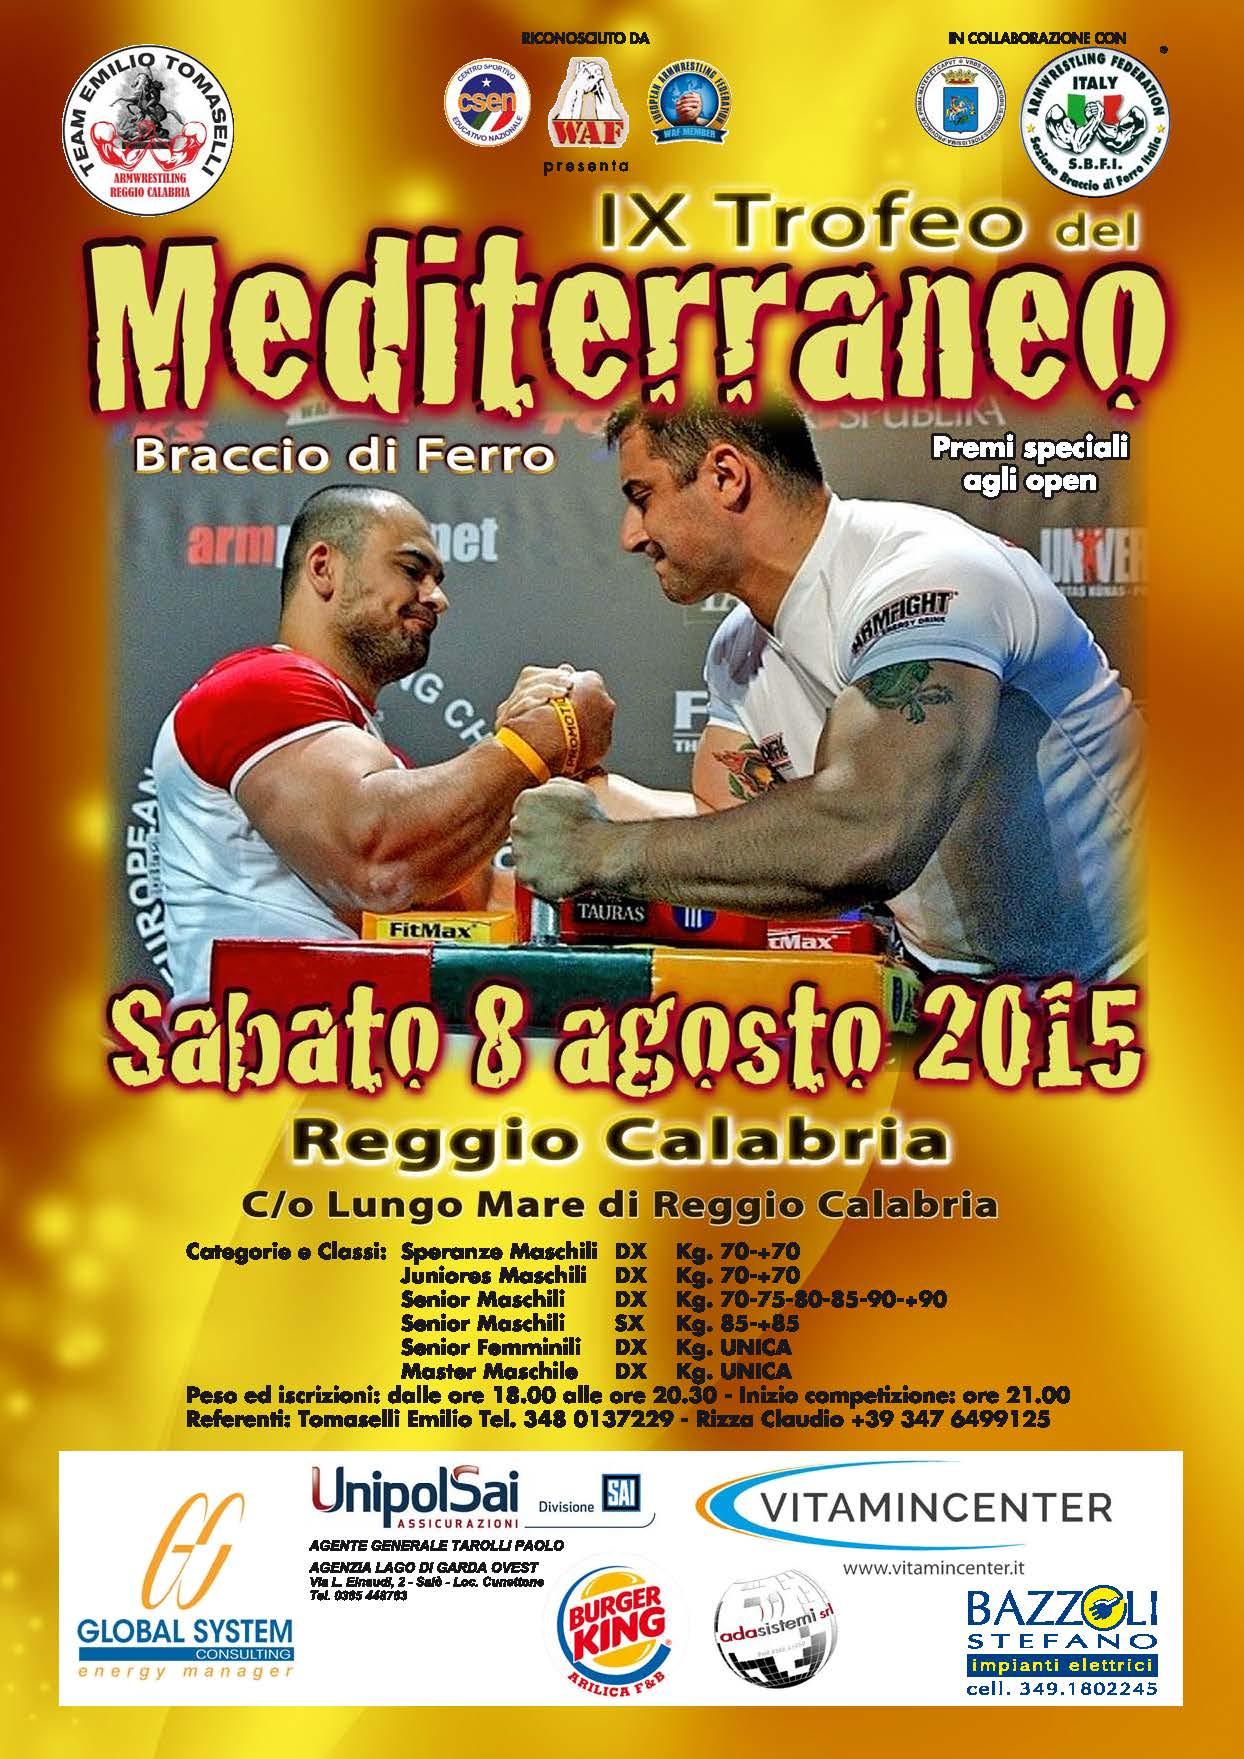 SBFI-Vol Trofeo Medit2015_Pagina_1